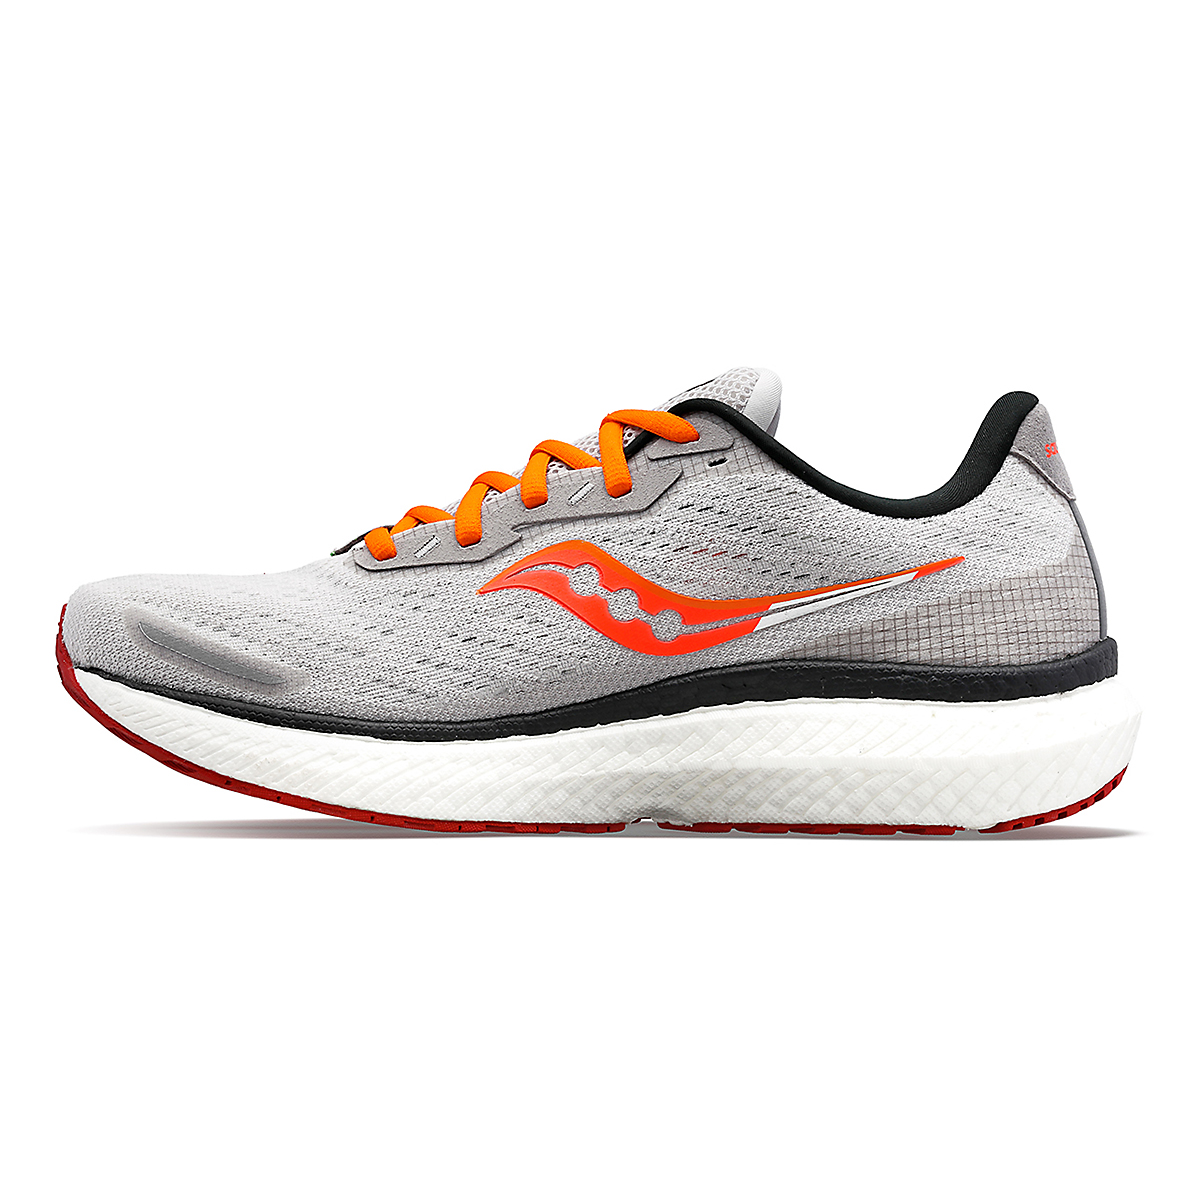 Men's Saucony Triumph 19 Running Shoe - Color: Jackalope - Size: 7 - Width: Regular, Jackalope, large, image 2